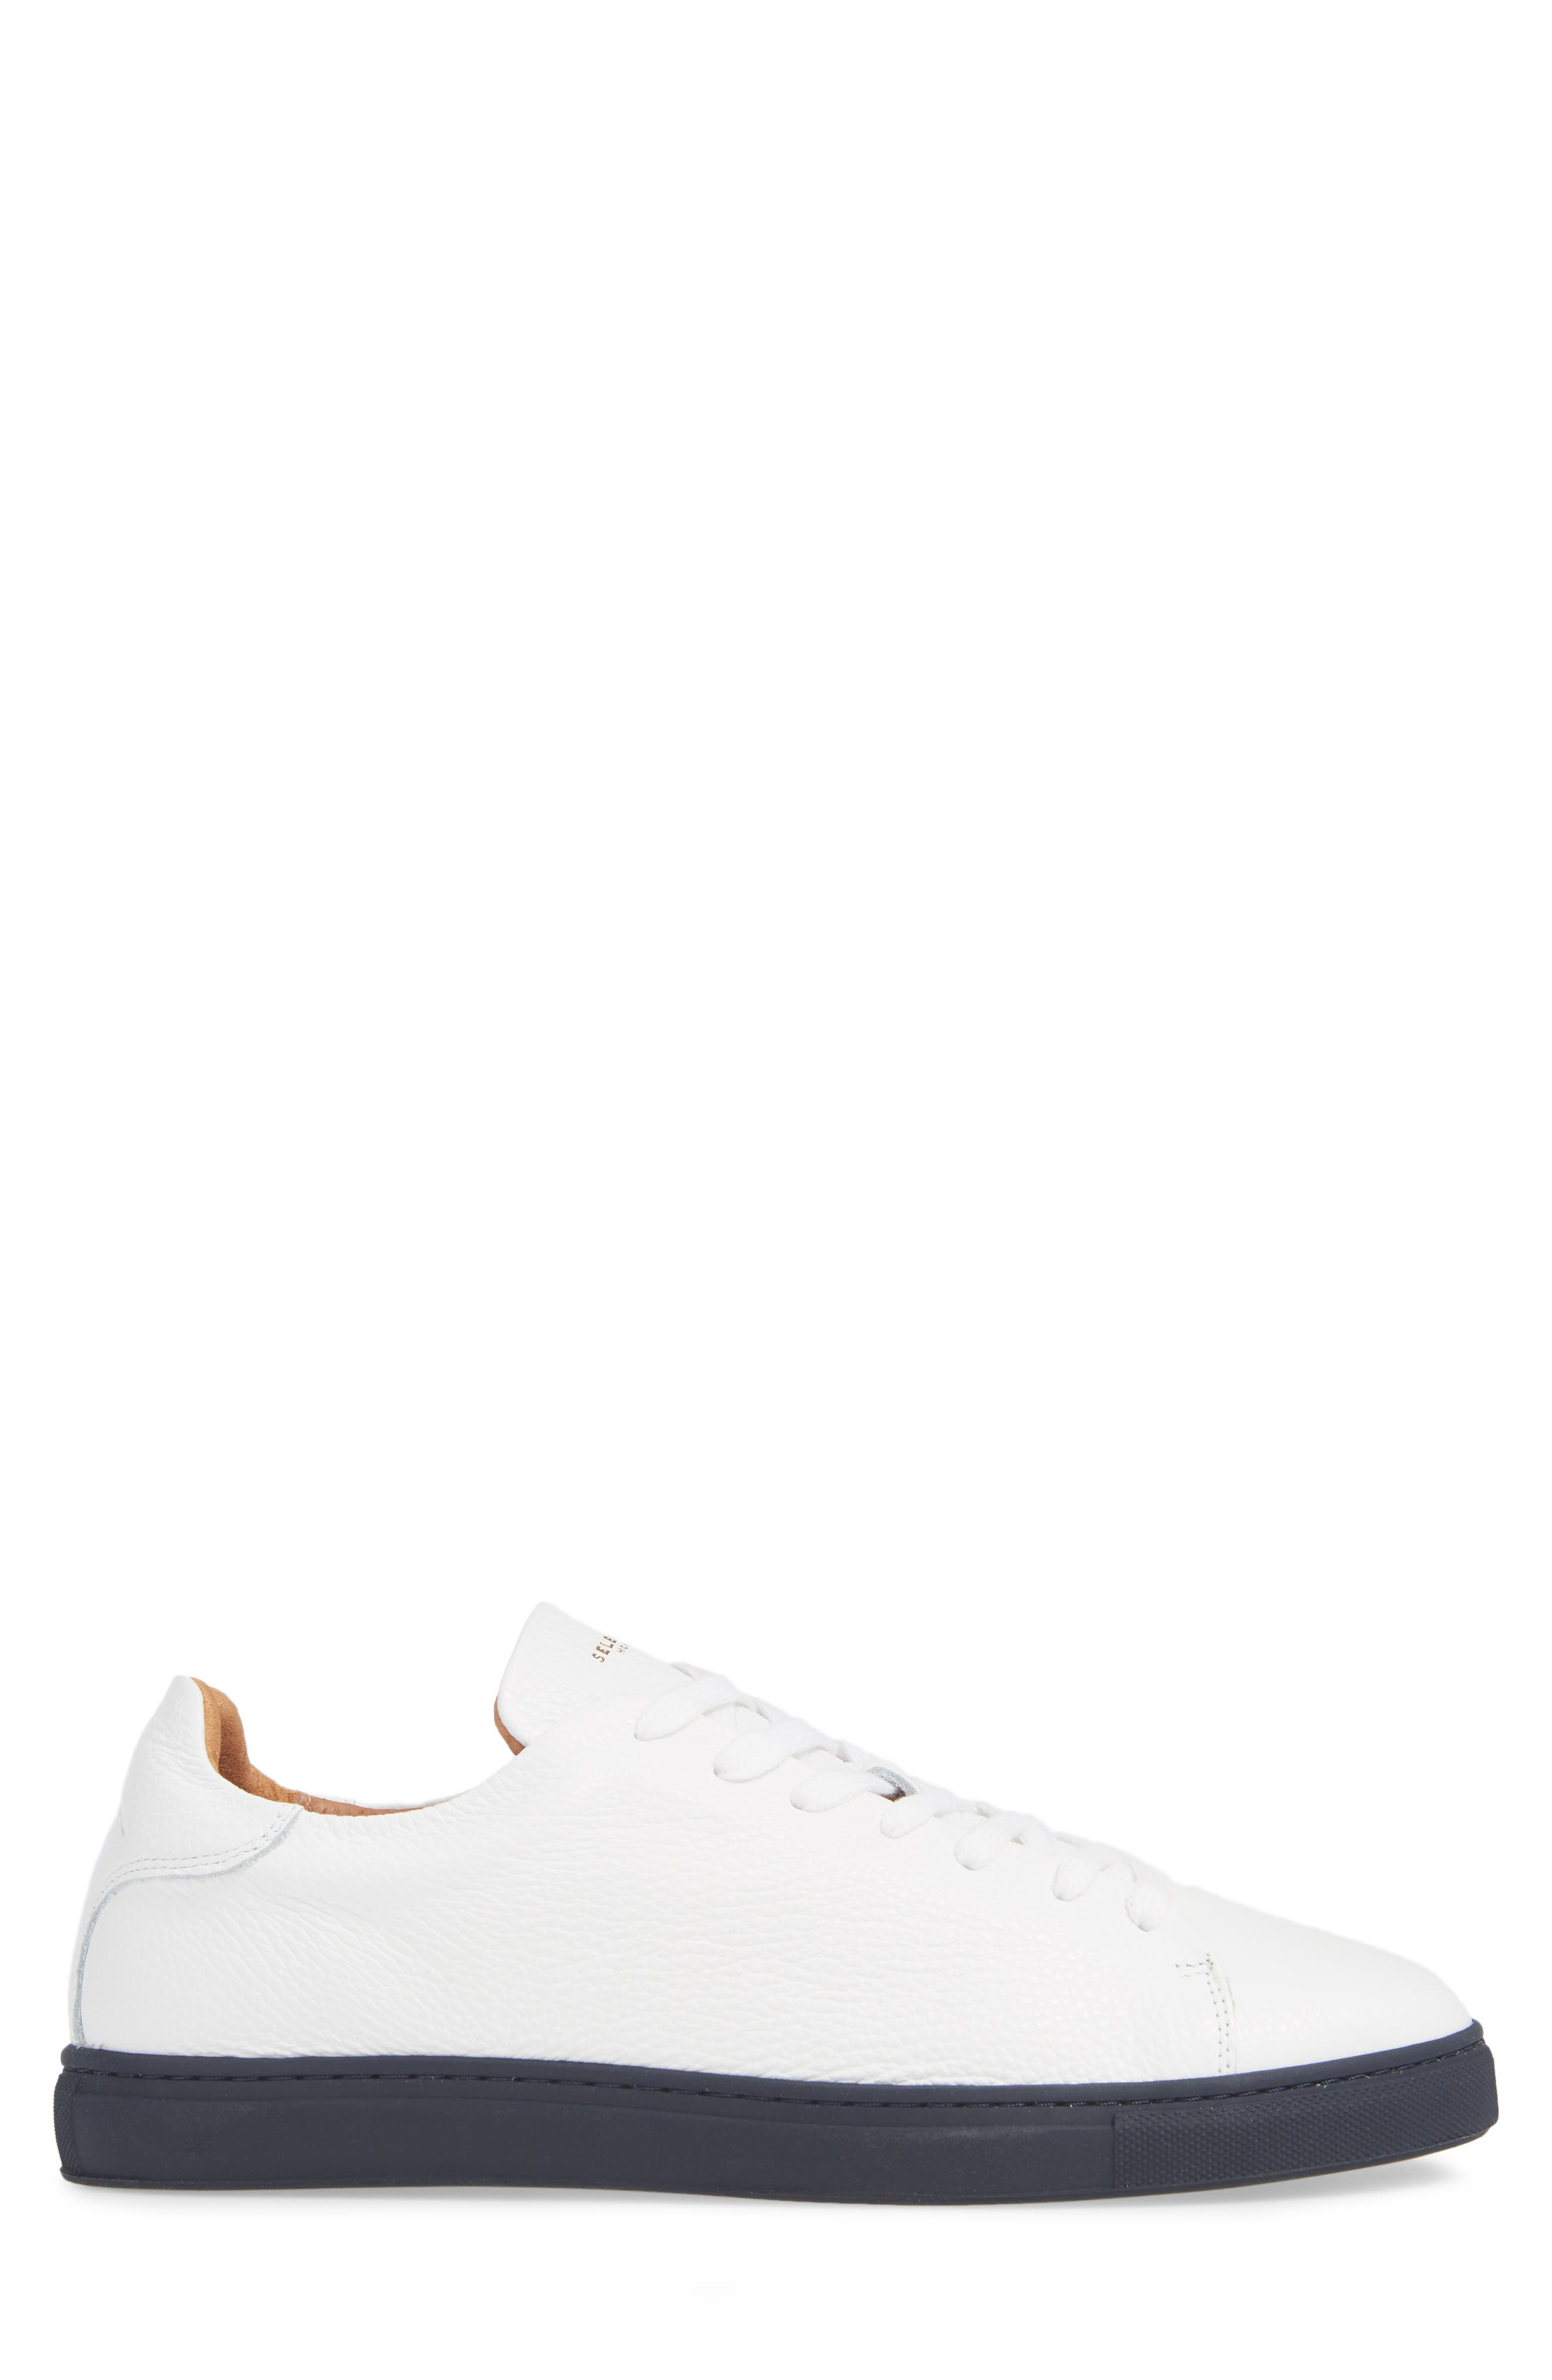 David Sneaker,                             Alternate thumbnail 3, color,                             WHITE/ DARK NAVY SOLE